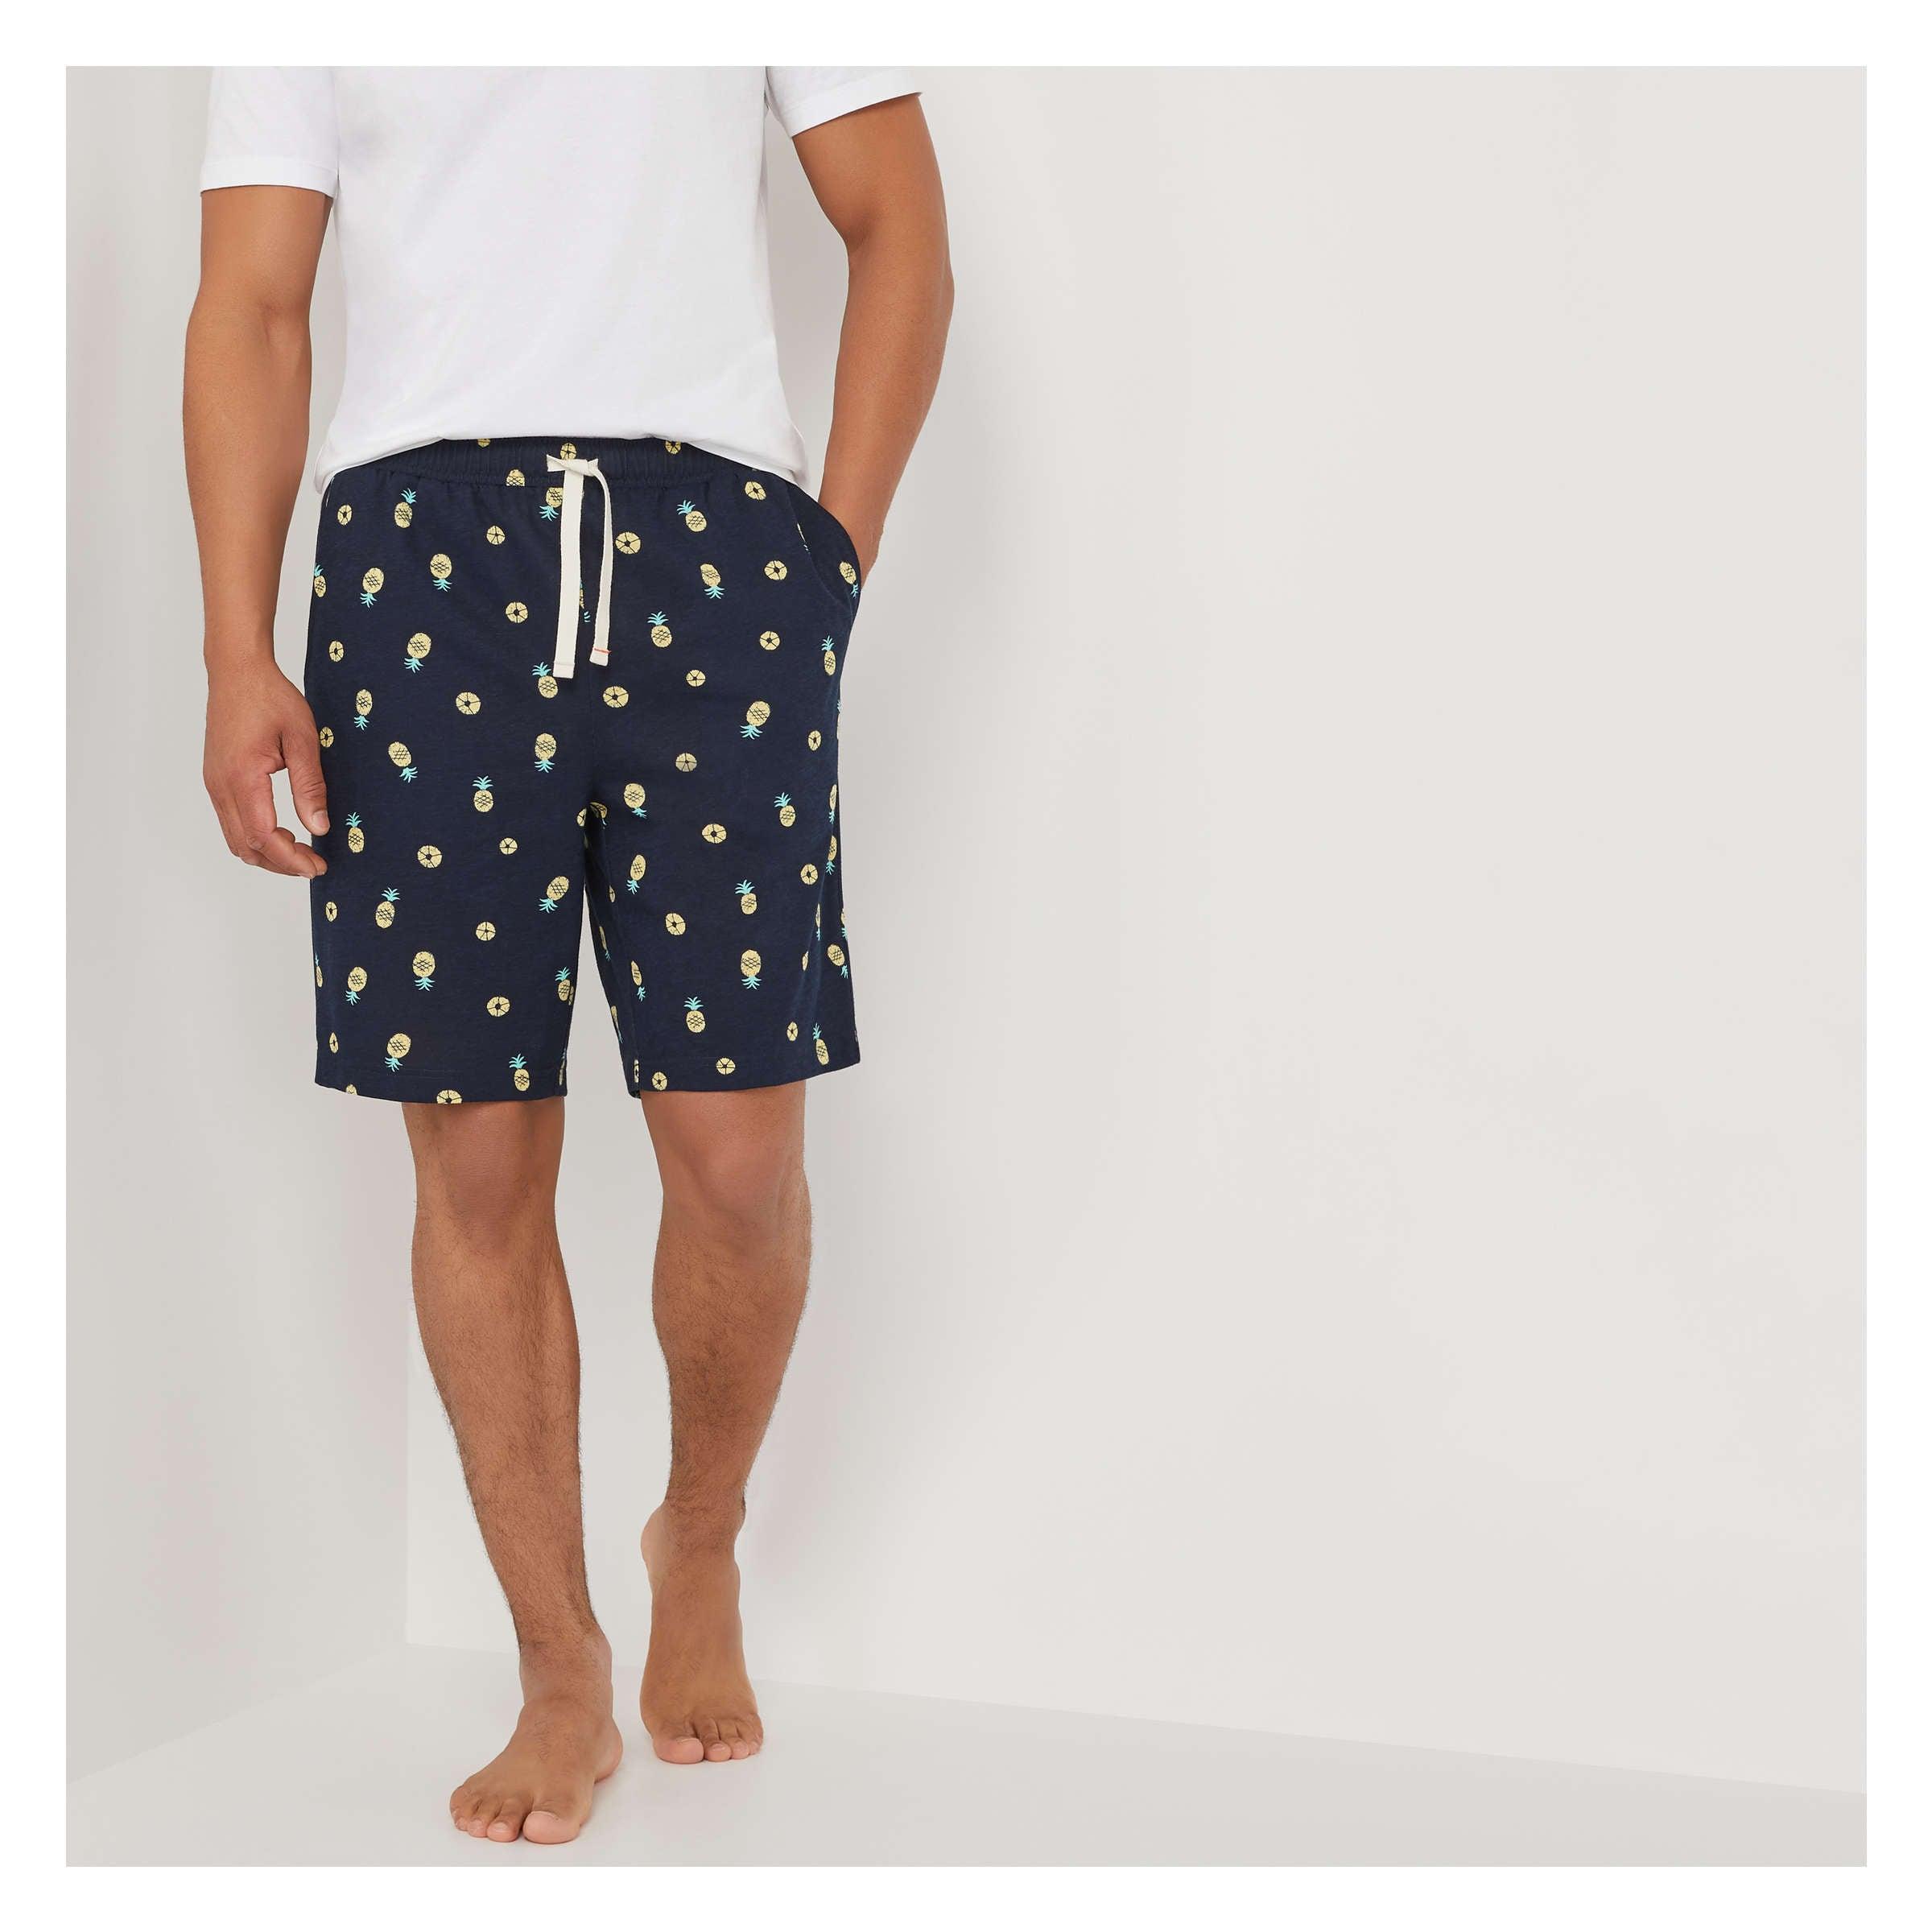 c71750ccff6 Men's Sleep Shorts in JF Midnight Blue from Joe Fresh